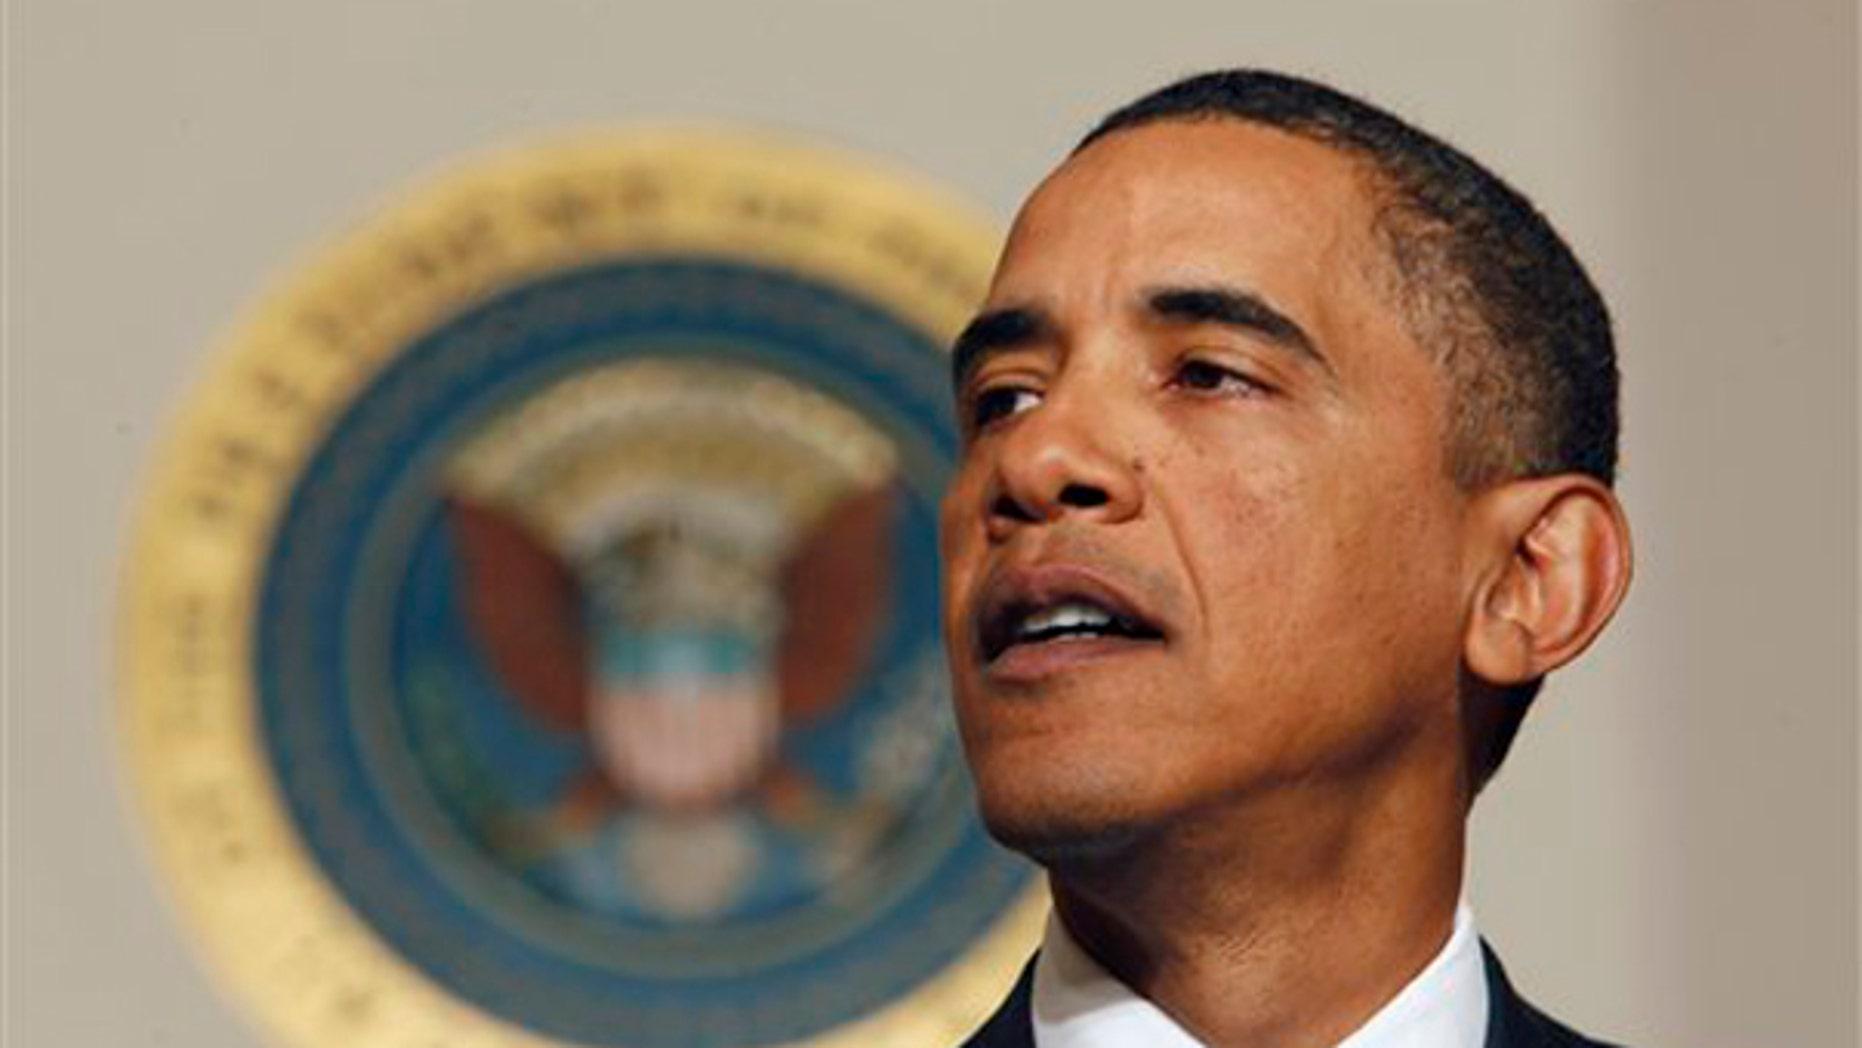 President Obama speaks about U.S. intelligence efforts at the White House Jan. 5. (AP Photo)